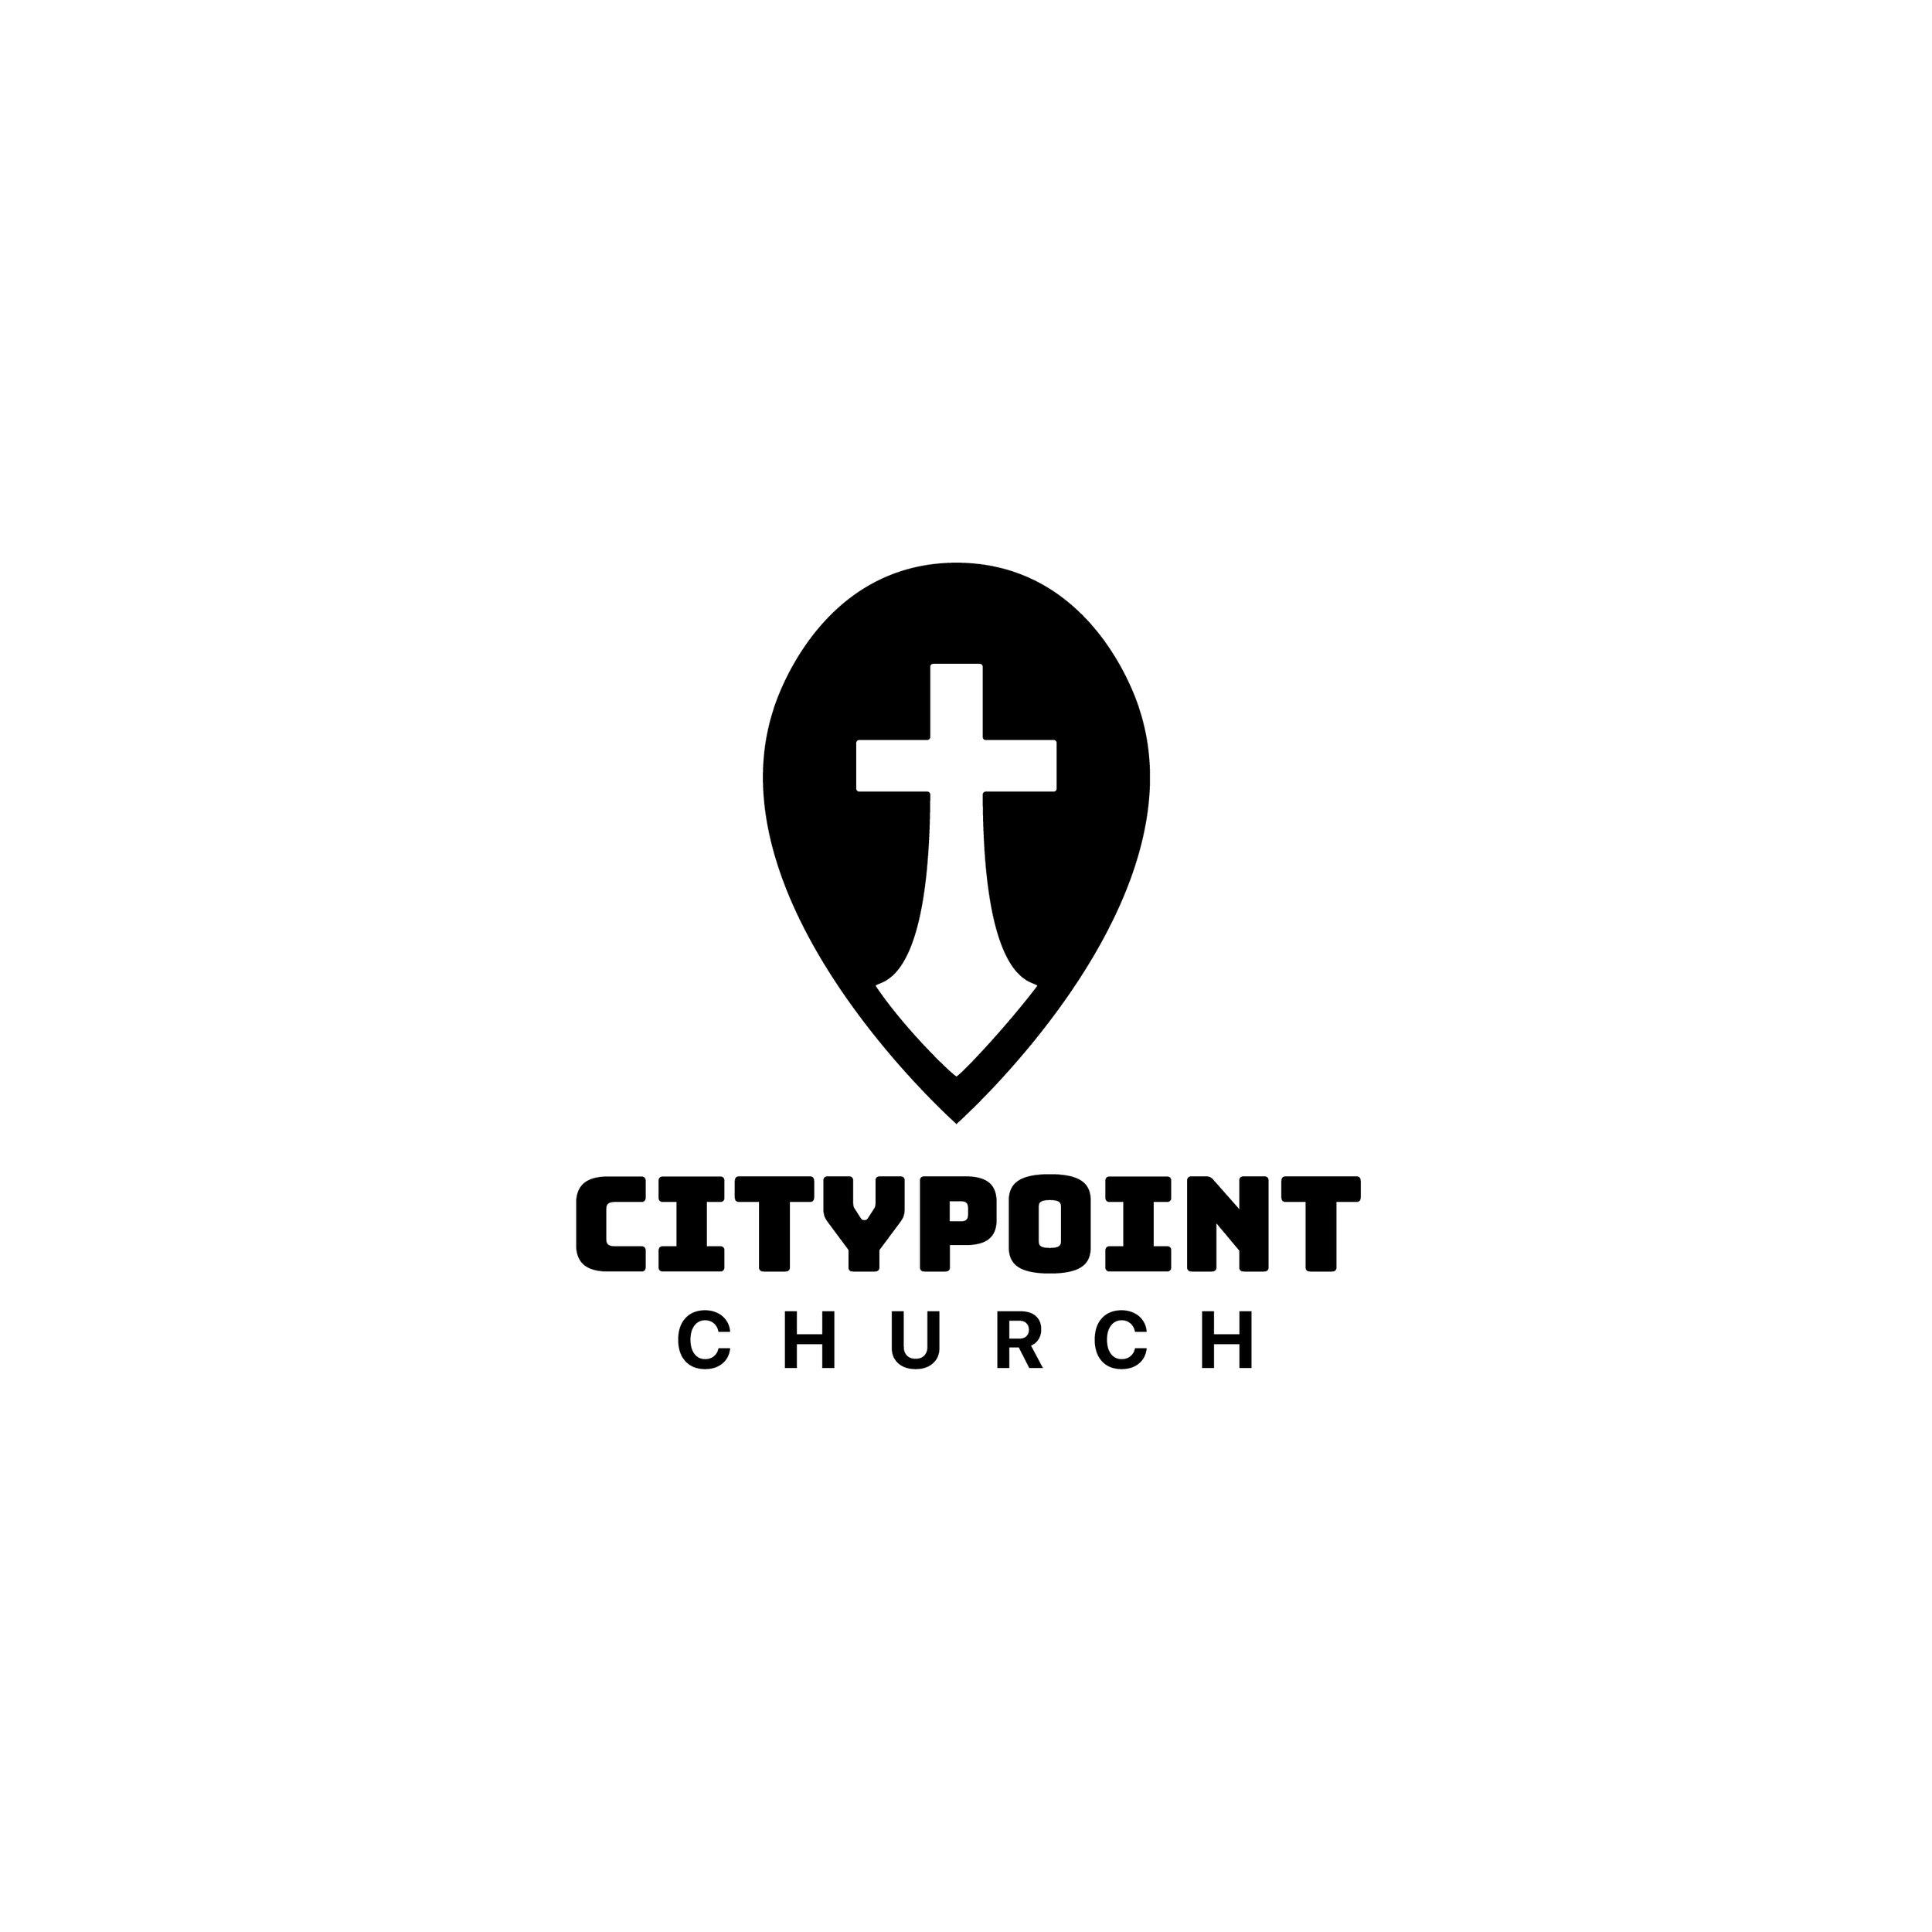 City Point Church.jpg